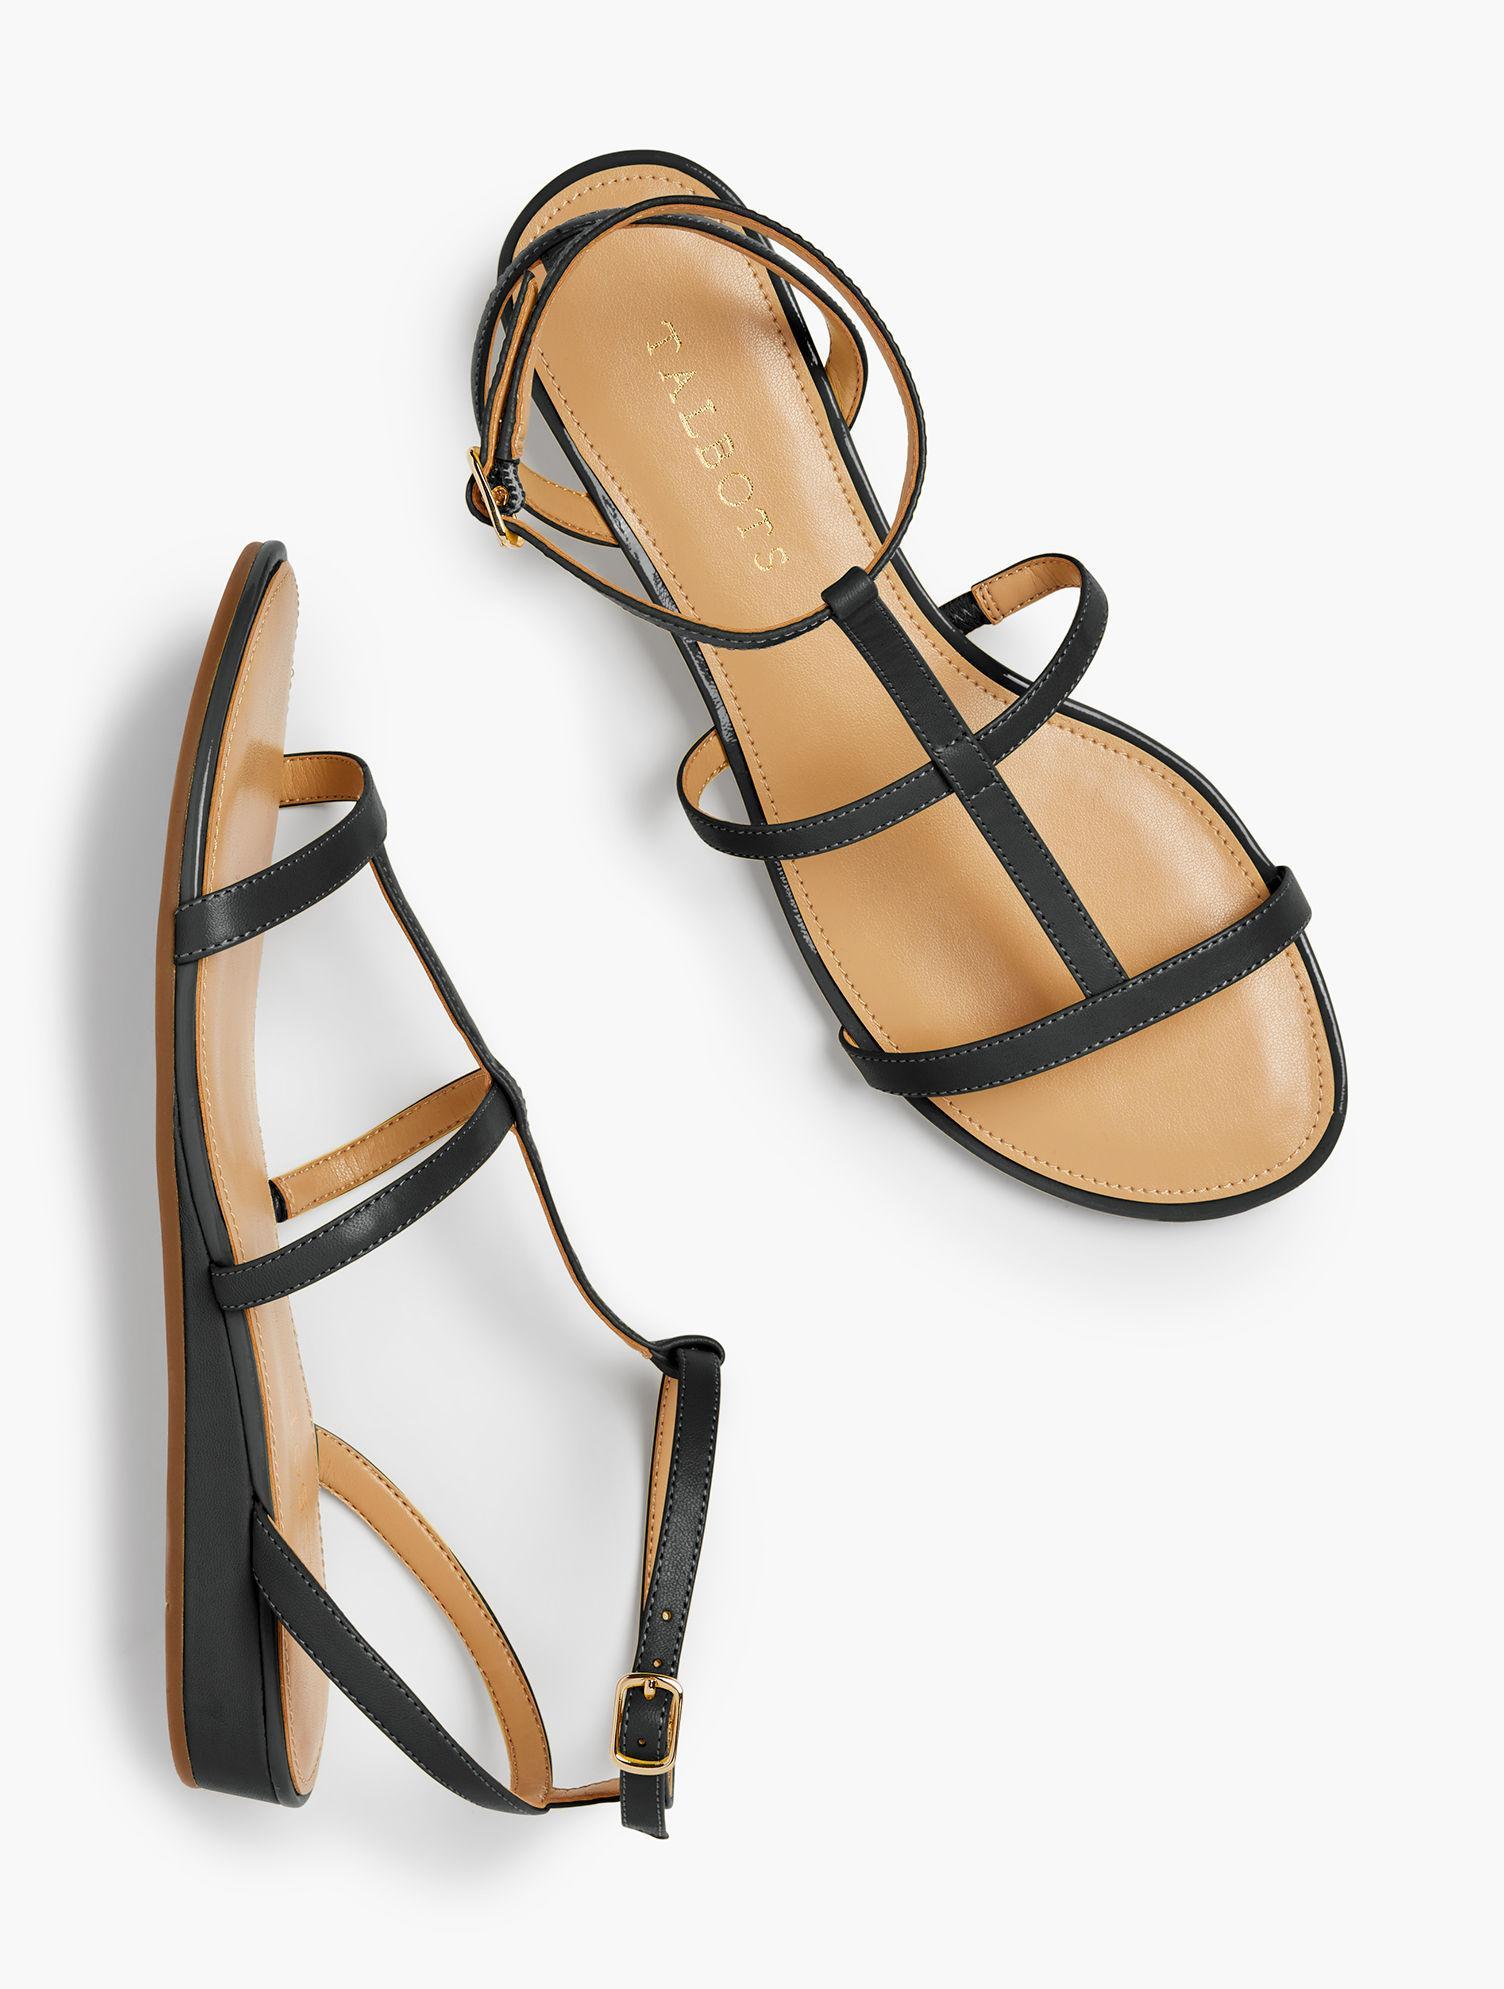 9510e966e Talbots - Black Daisy Gladiator Micro-wedge Sandals - Lyst. View fullscreen